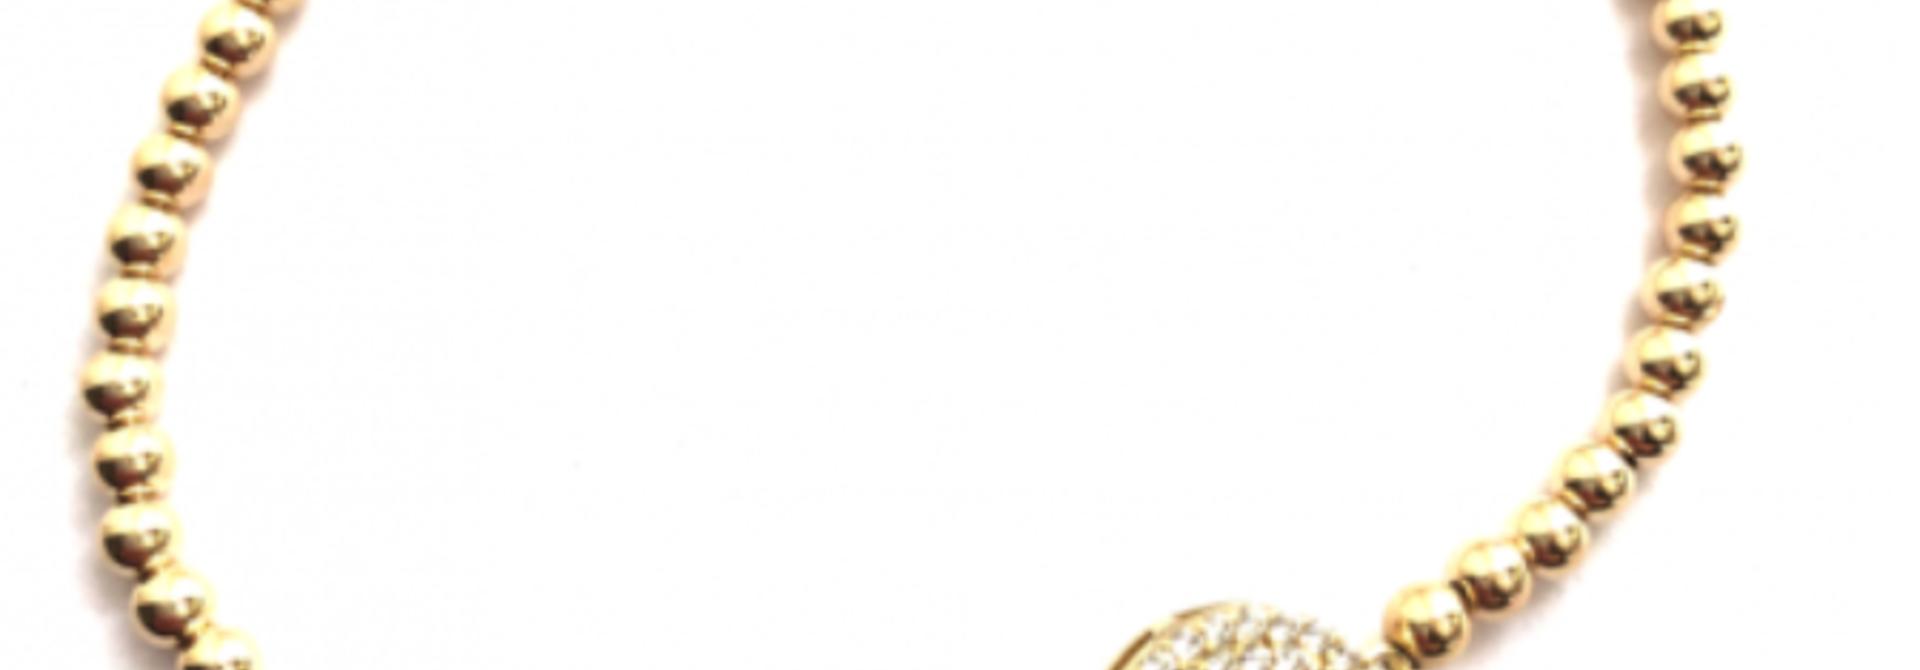 Bracelet smiley gold